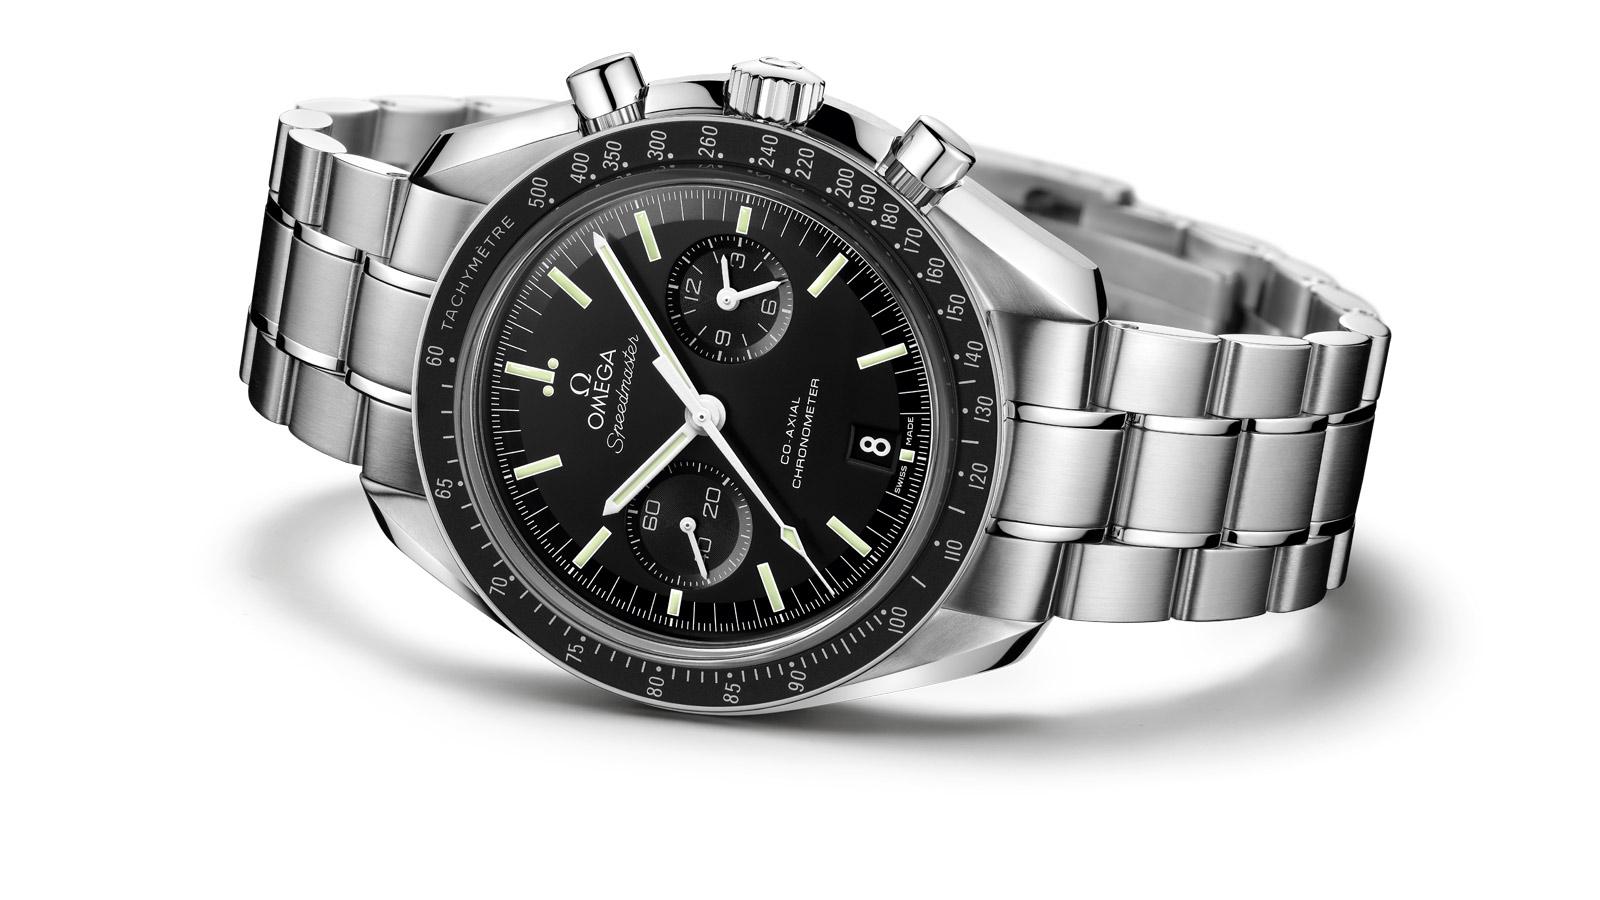 Sp Moonwatch Chrono 31130445101002 Vuec 1600x900